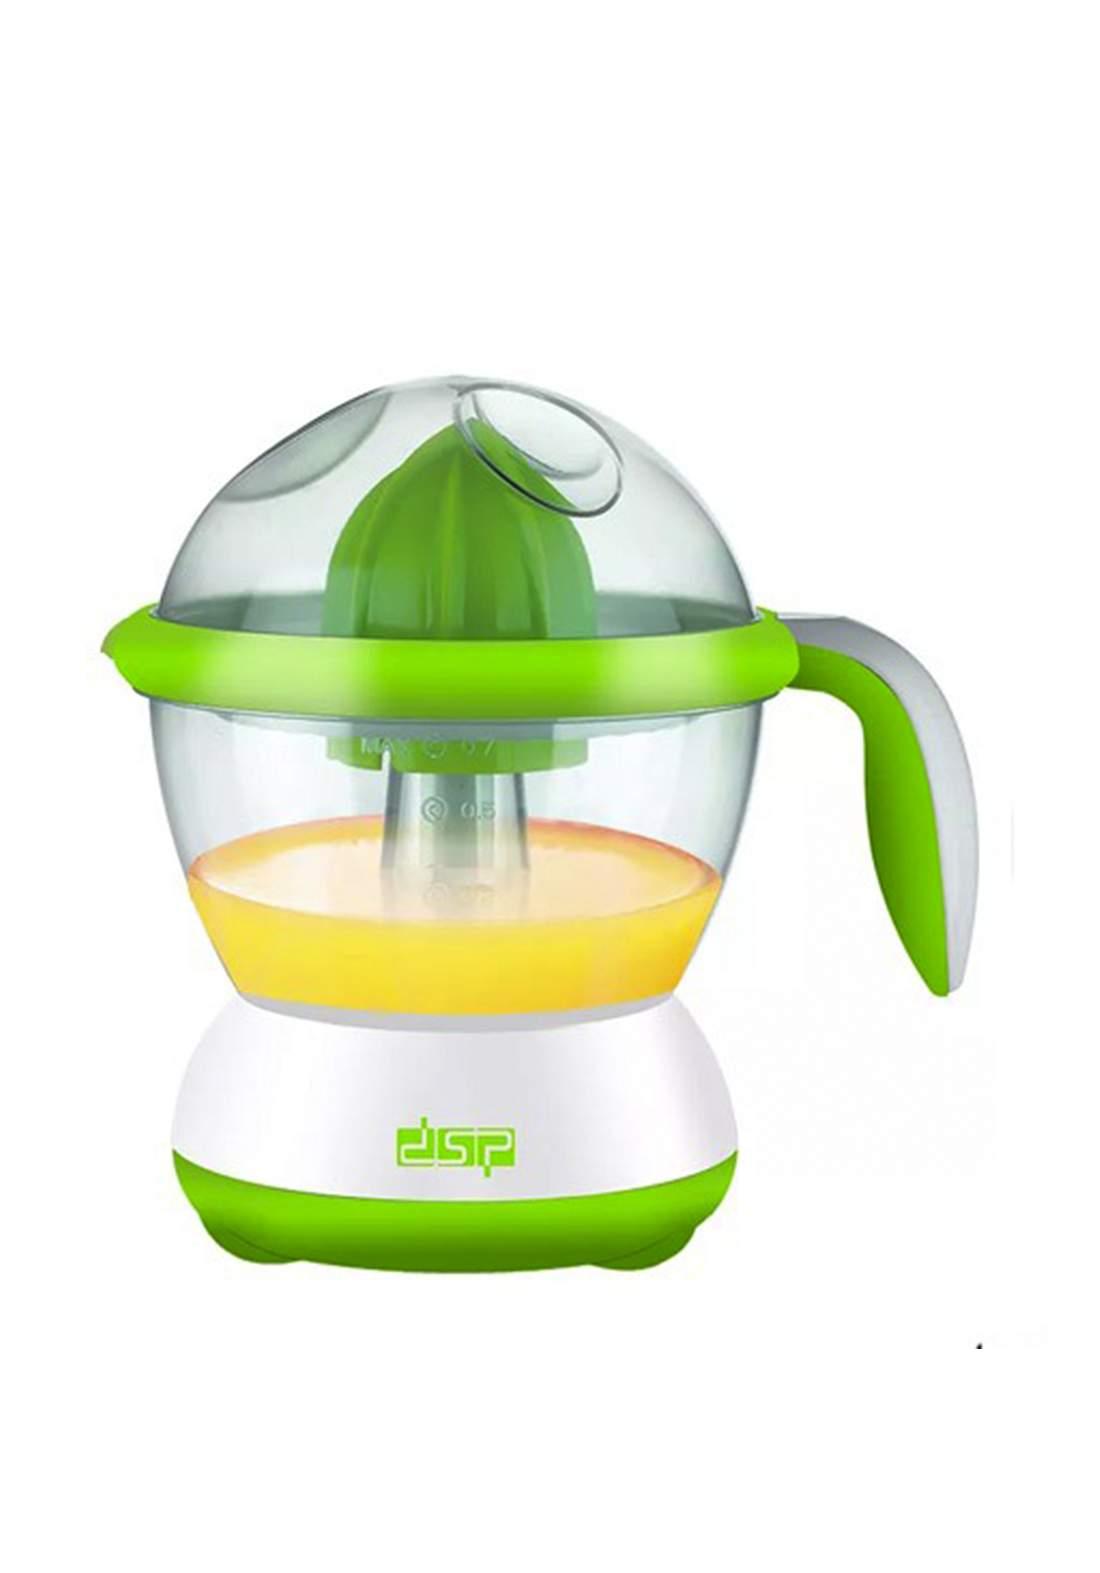 DSP 1016 Citrus Juice - Green عصارة حمضيات